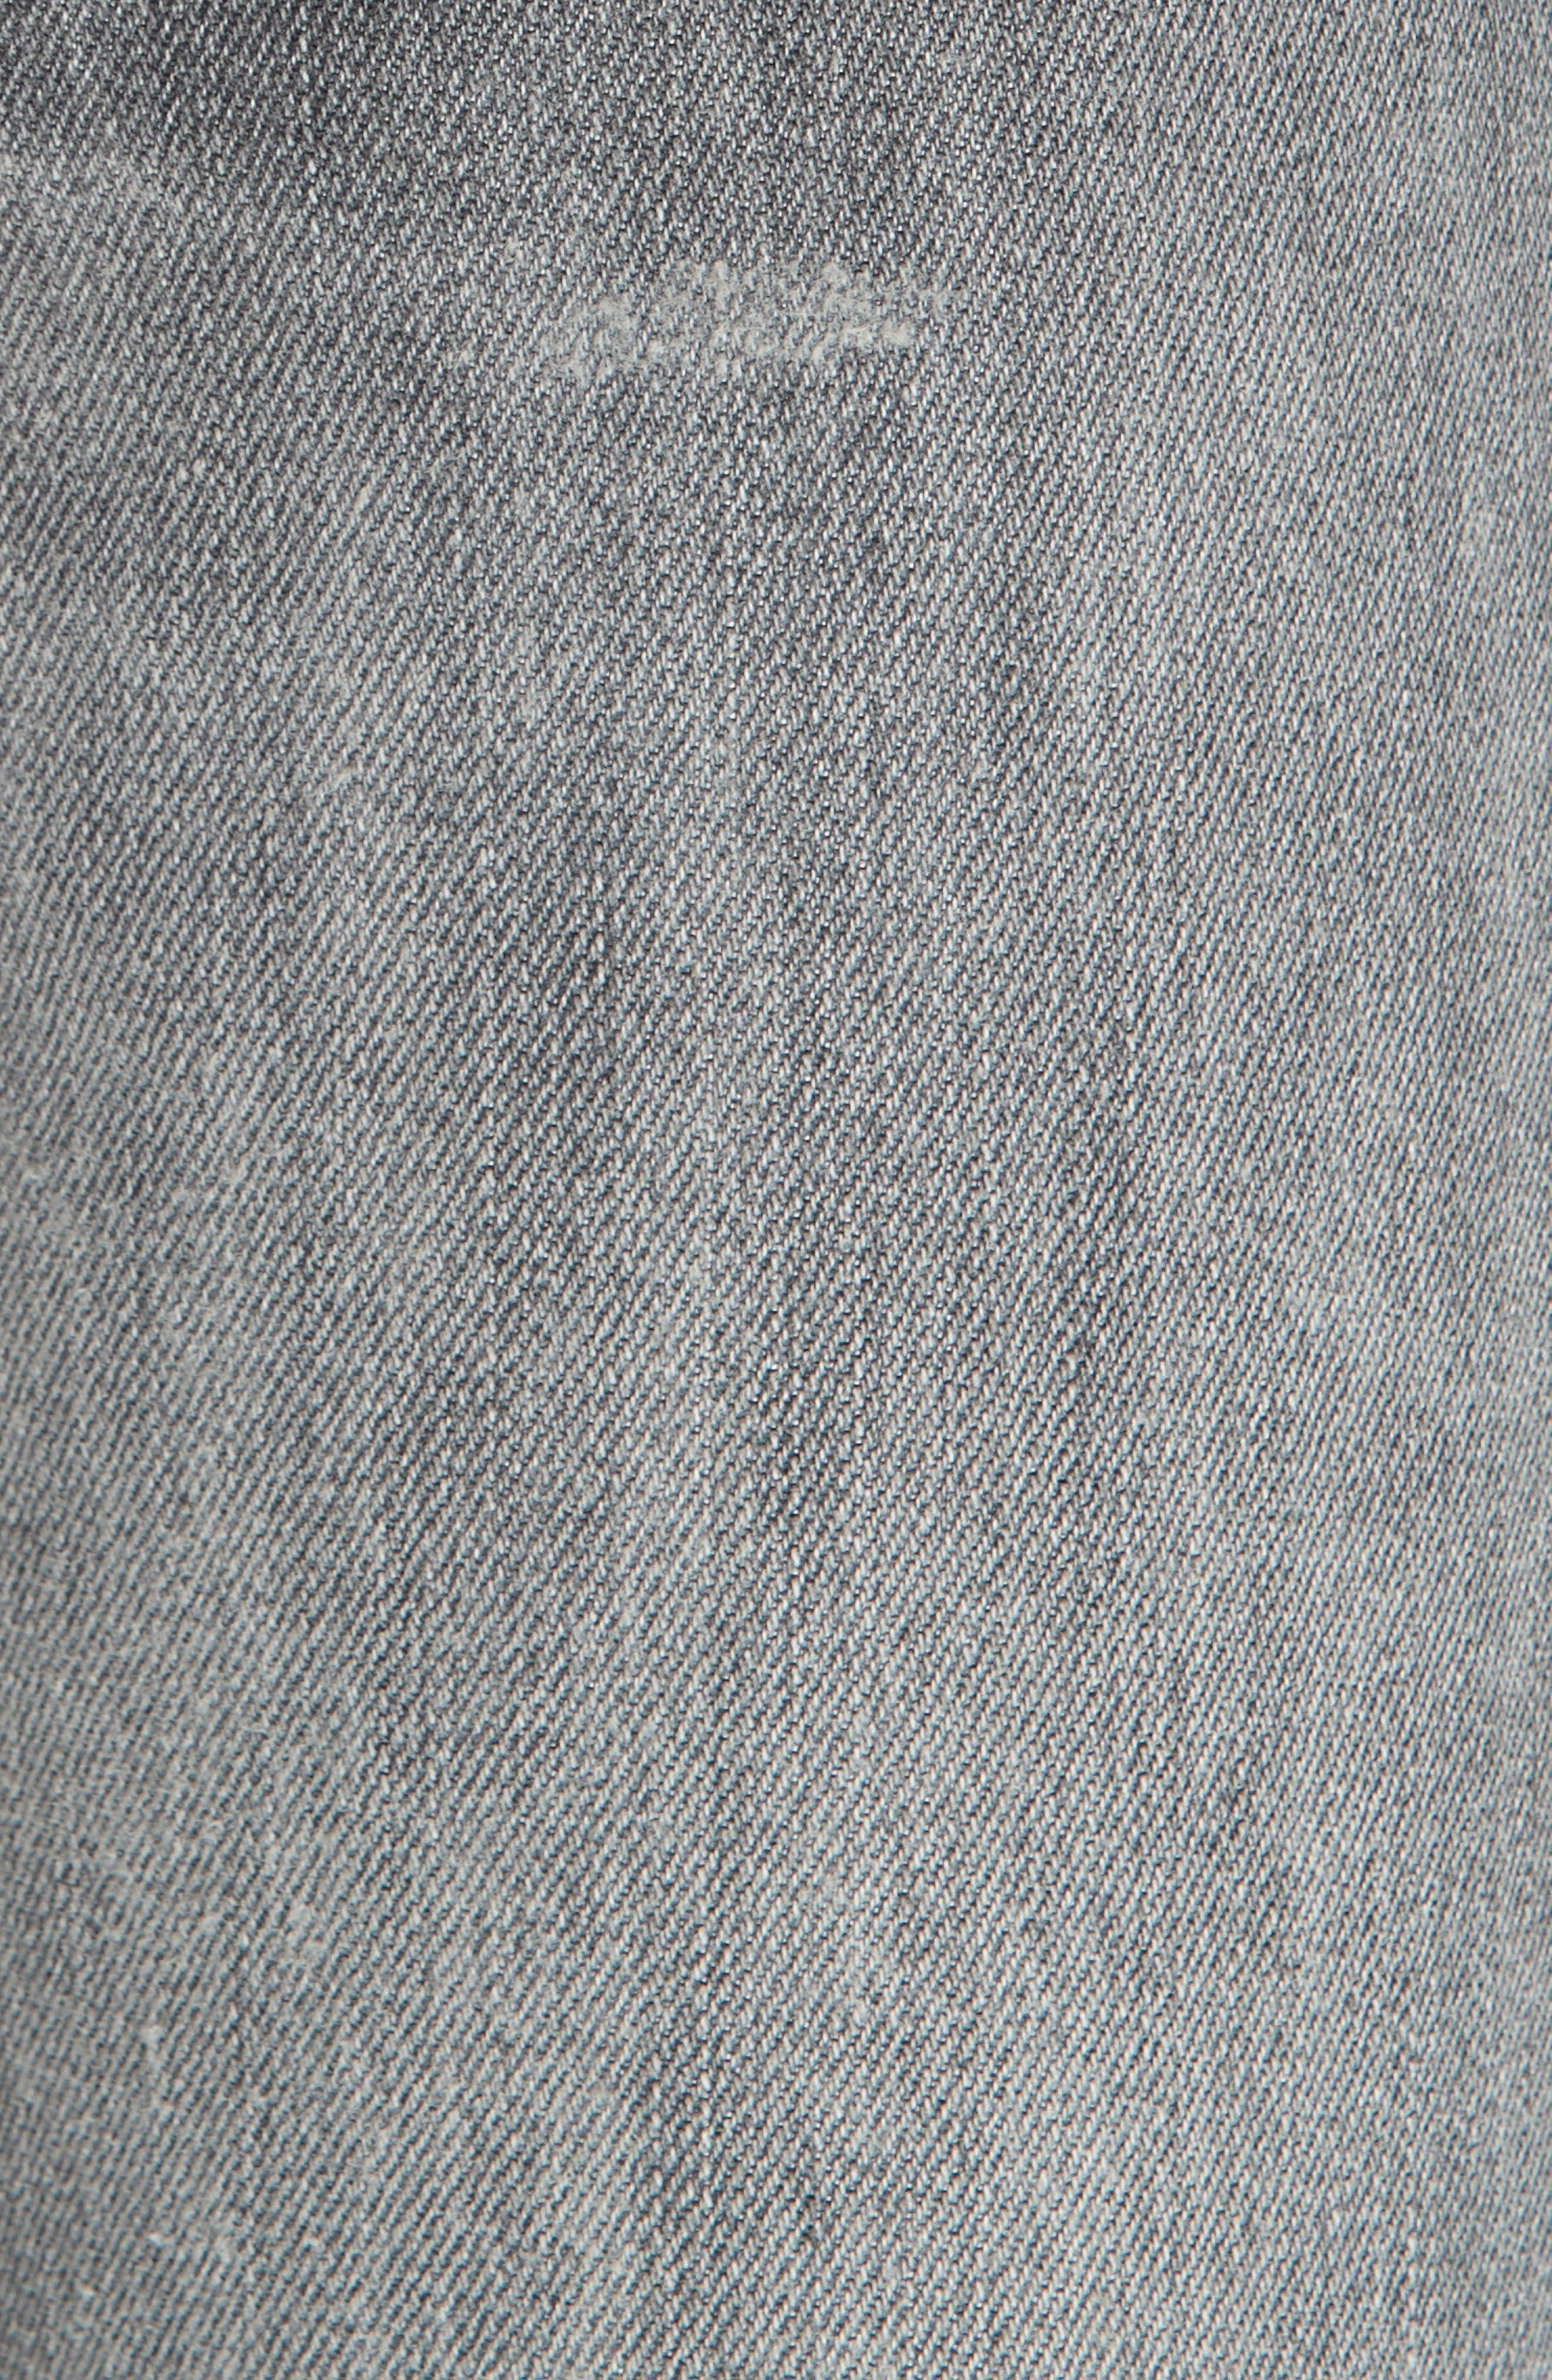 High Waist Slim Straight Crop Jeans,                             Alternate thumbnail 5, color,                             GREY